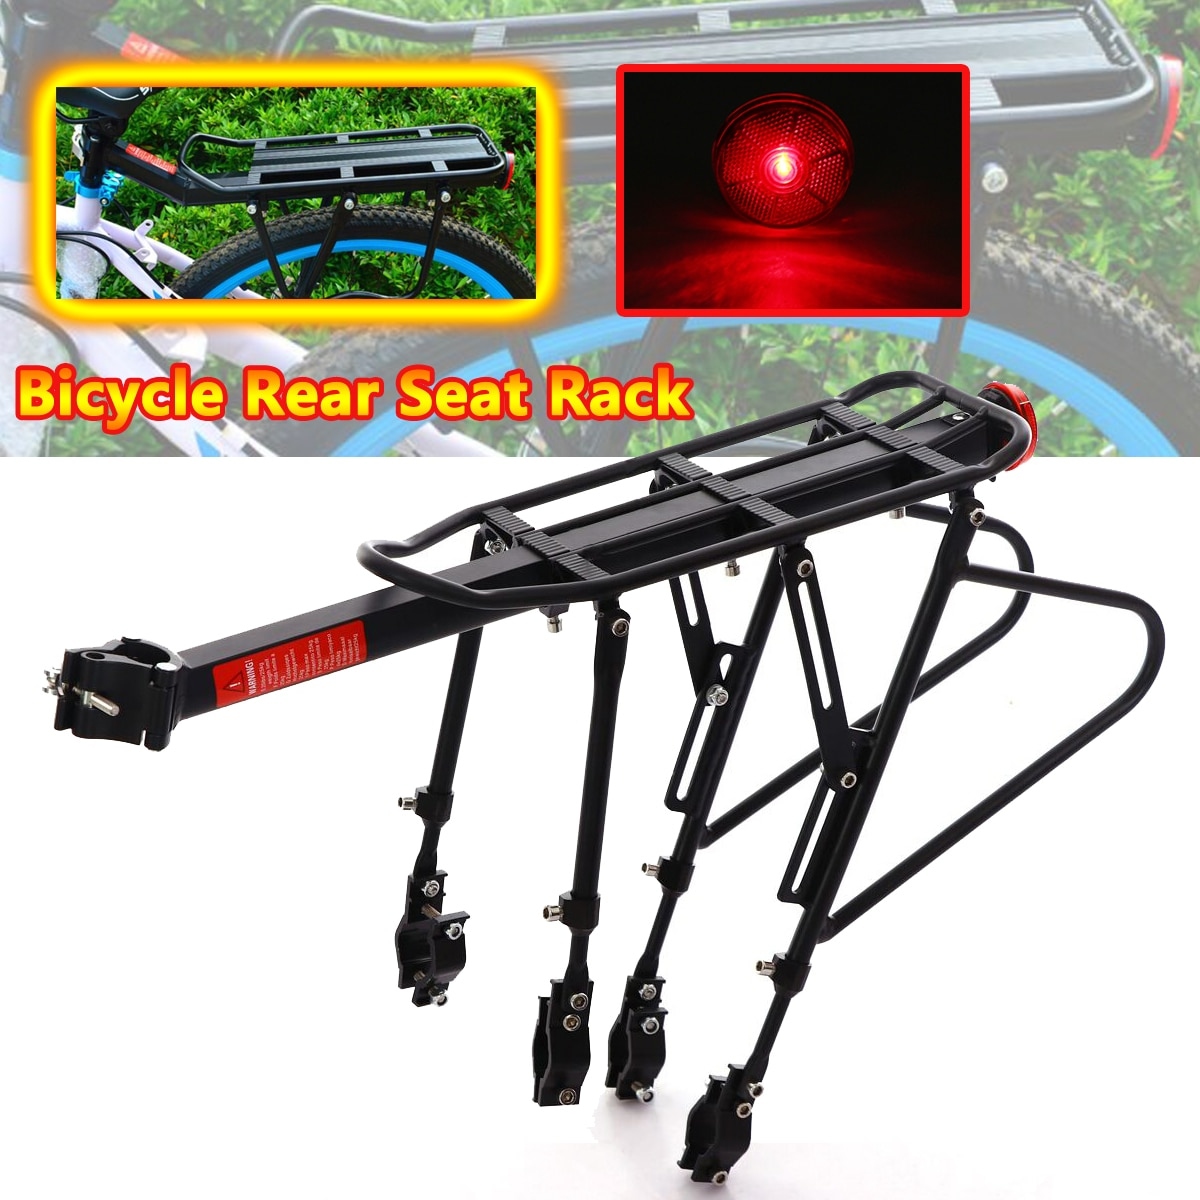 Bicycle MTB Bike Rear Rack Reflector Seat Post Mount Pannier Luggage Carrier Shelf Bracket 50kg Quick release